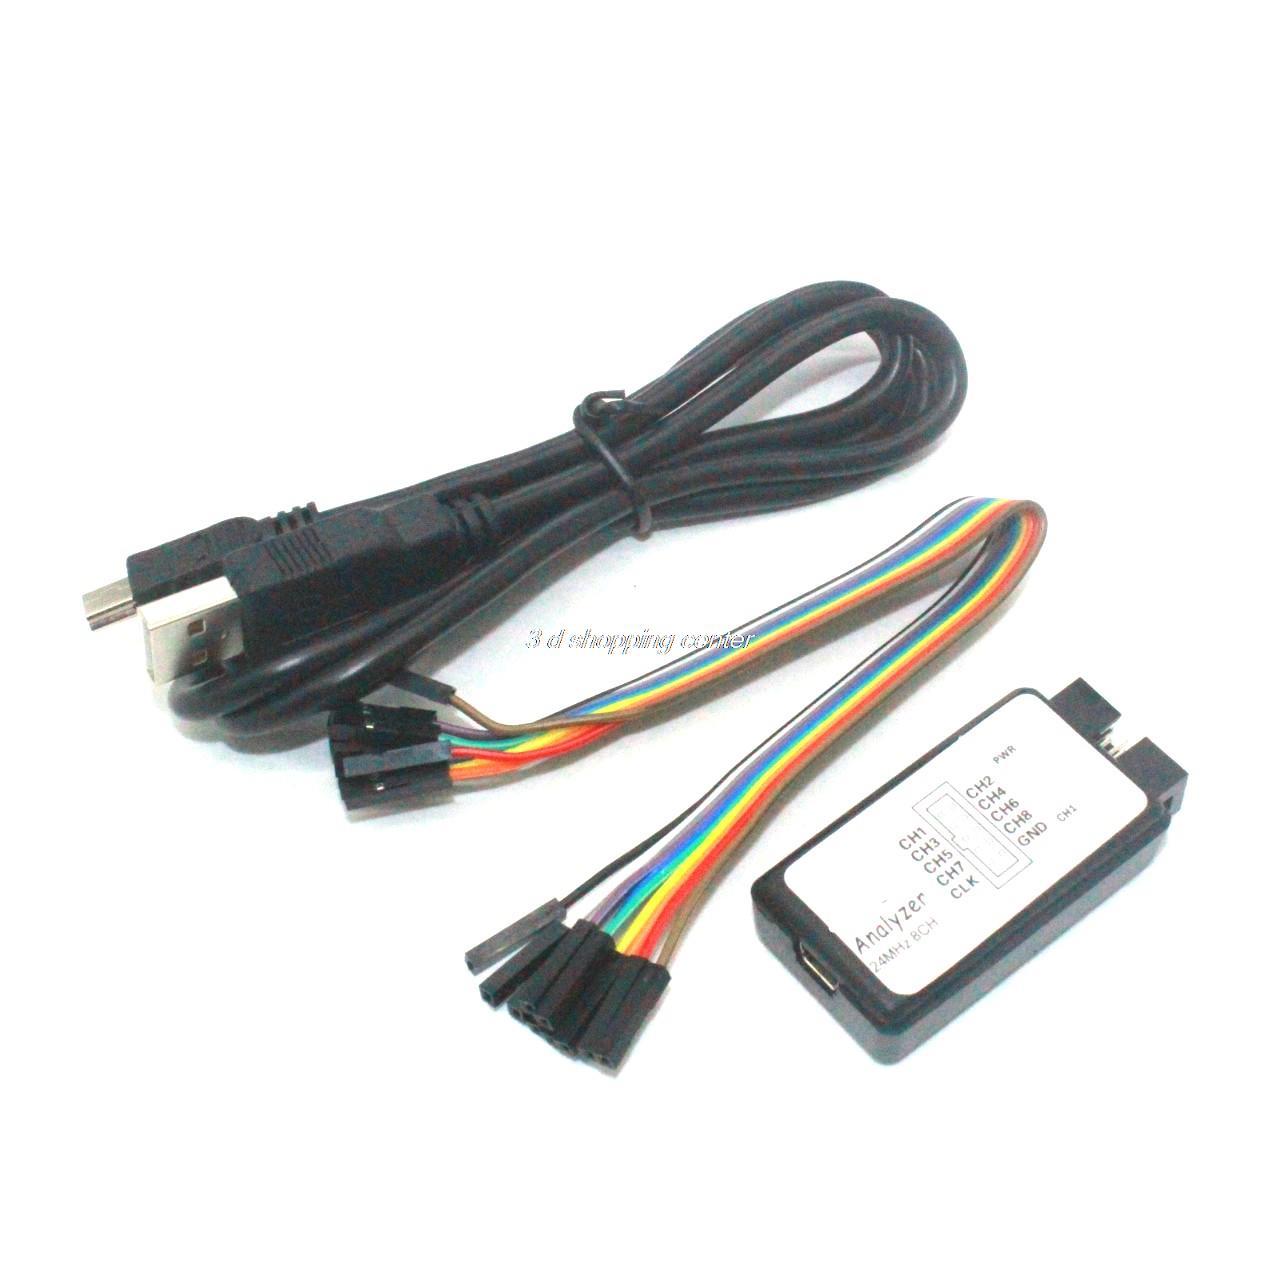 1sets New Arrival USB Logic Analyze 24M 8CH, MCU ARM FPGA DSP debug tool(China (Mainland))